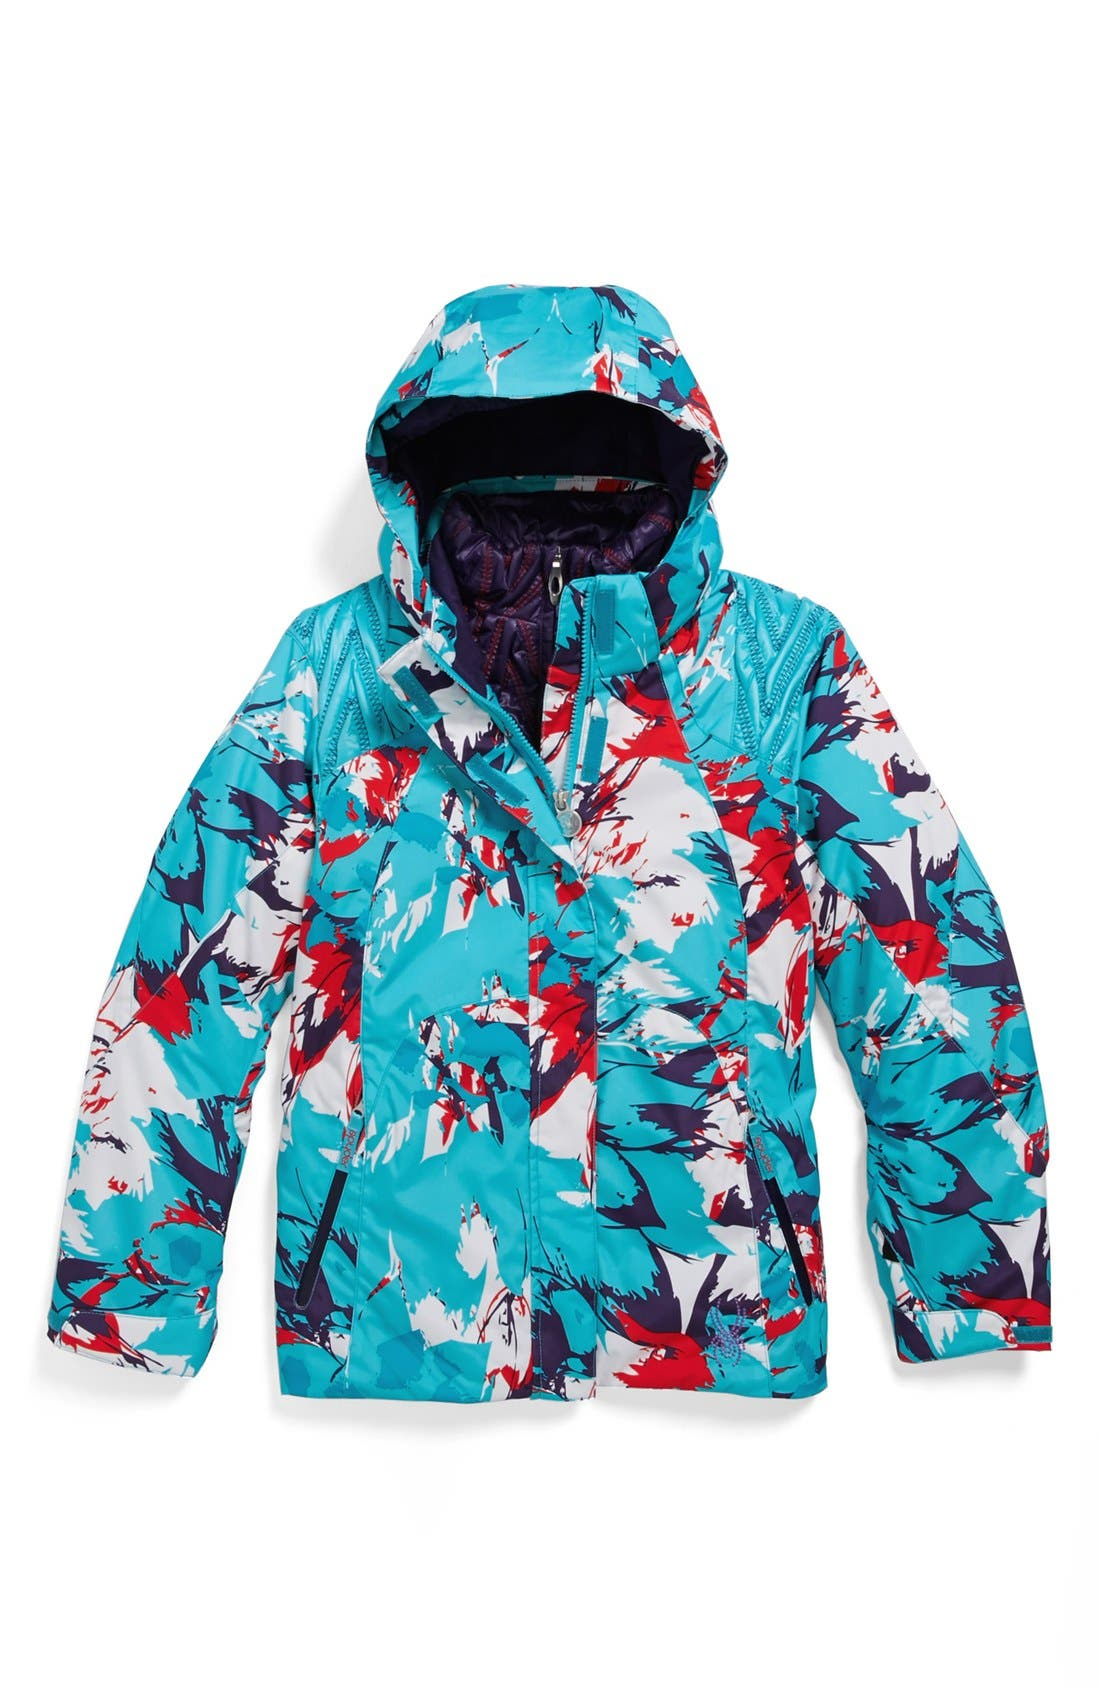 Alternate Image 1 Selected - Spyder 3-in-1 'Stunner' Reversible Hooded Jacket (Big Girls)